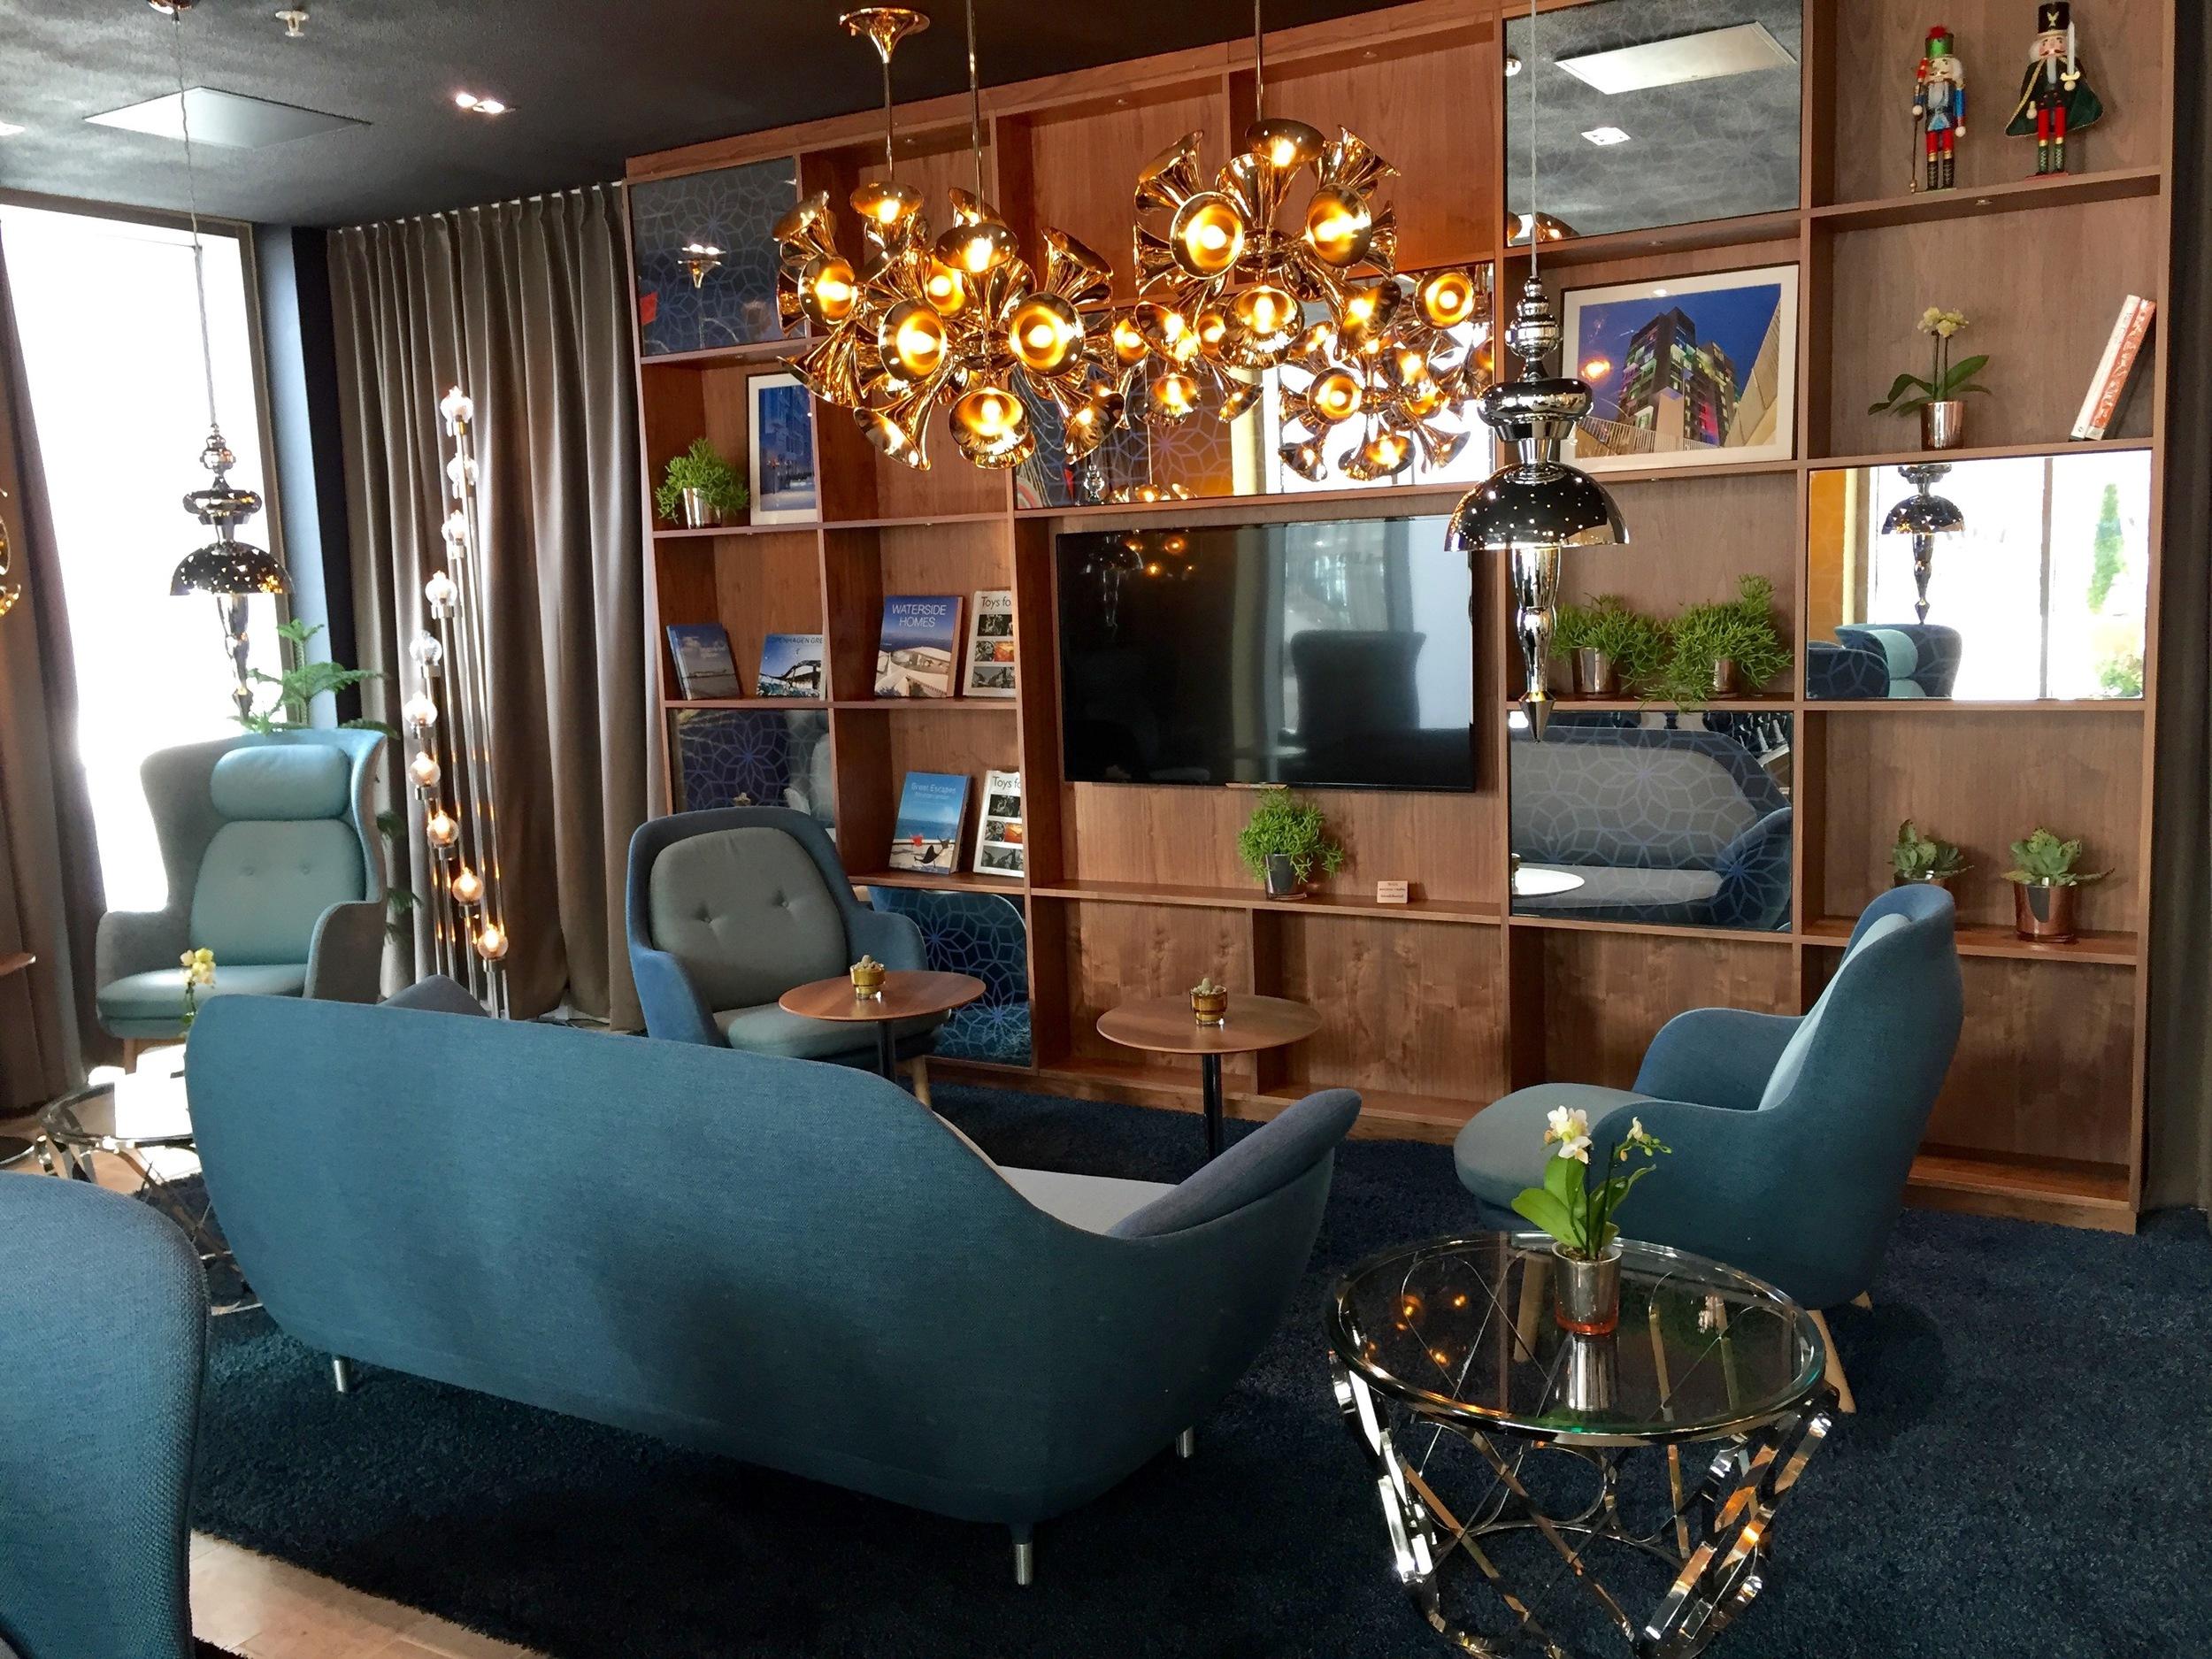 Vil du ha et godt hotelltips i København? Hotel Tivoli er et godt valg. Foto: Odd Roar Lange